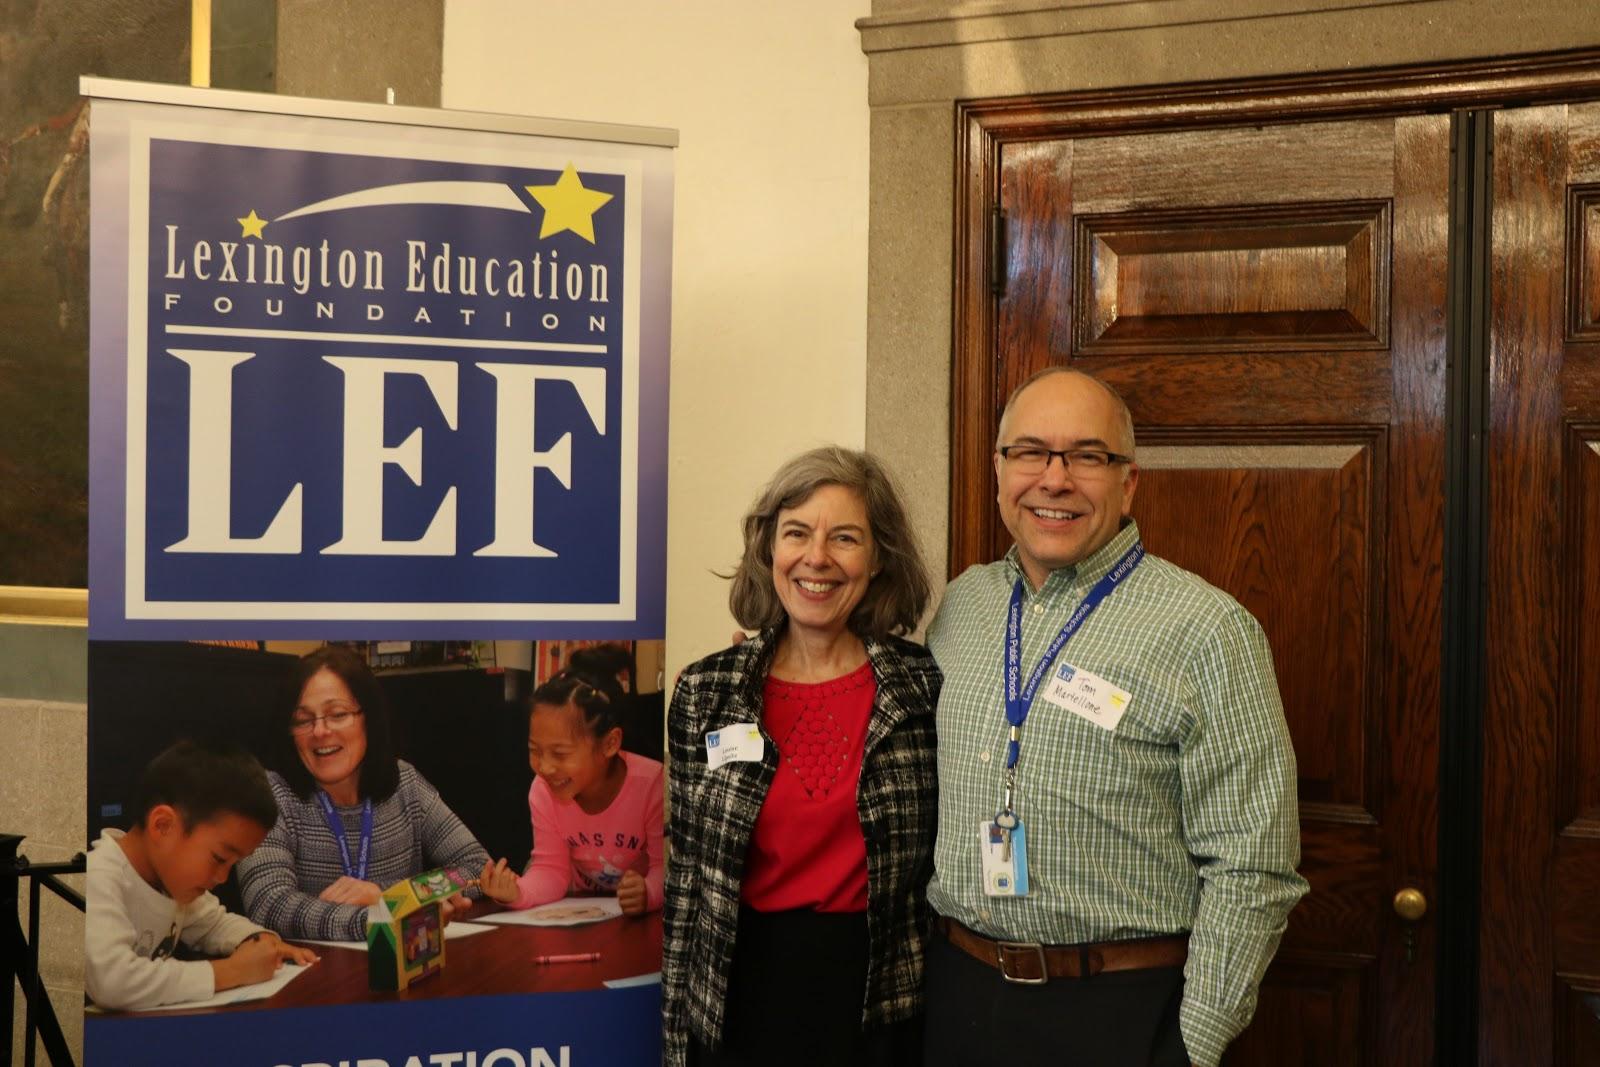 Photo of Louise Lipsitz and Tom Martellone courtesy of LHS student Sophia Sullivan